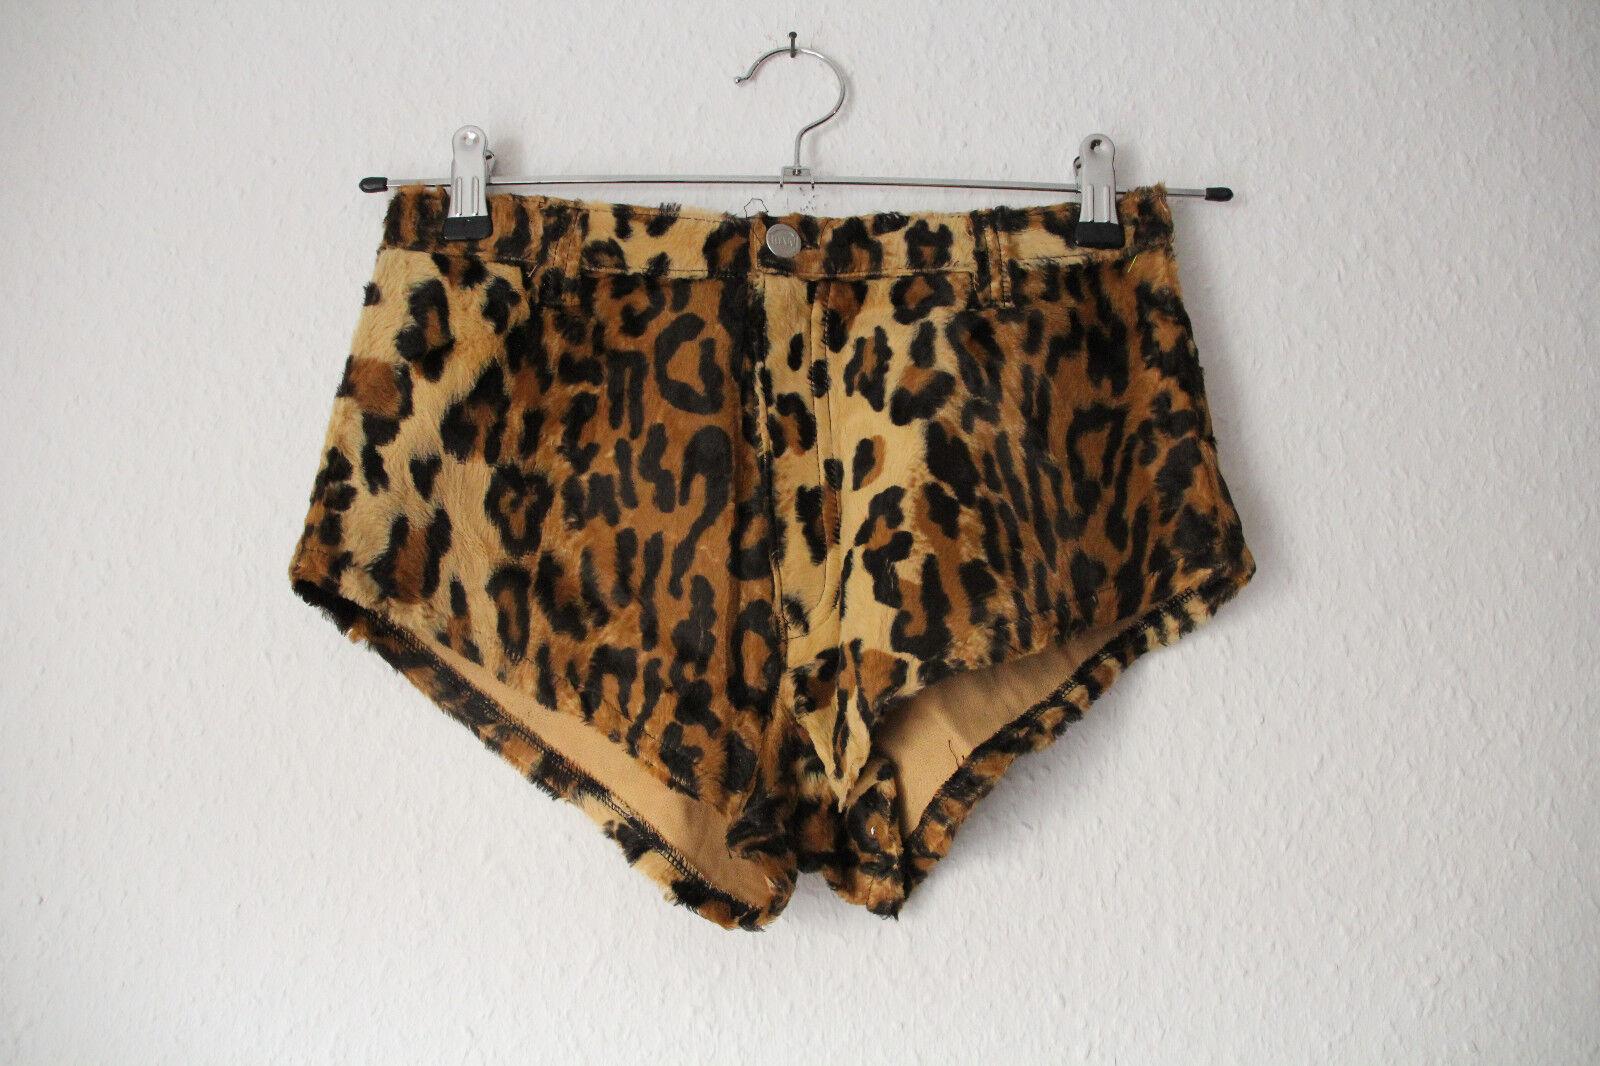 Hotpants Tierimitat Leopard von Mode Wichtig, Größe M (Disco 80s Party Pop)